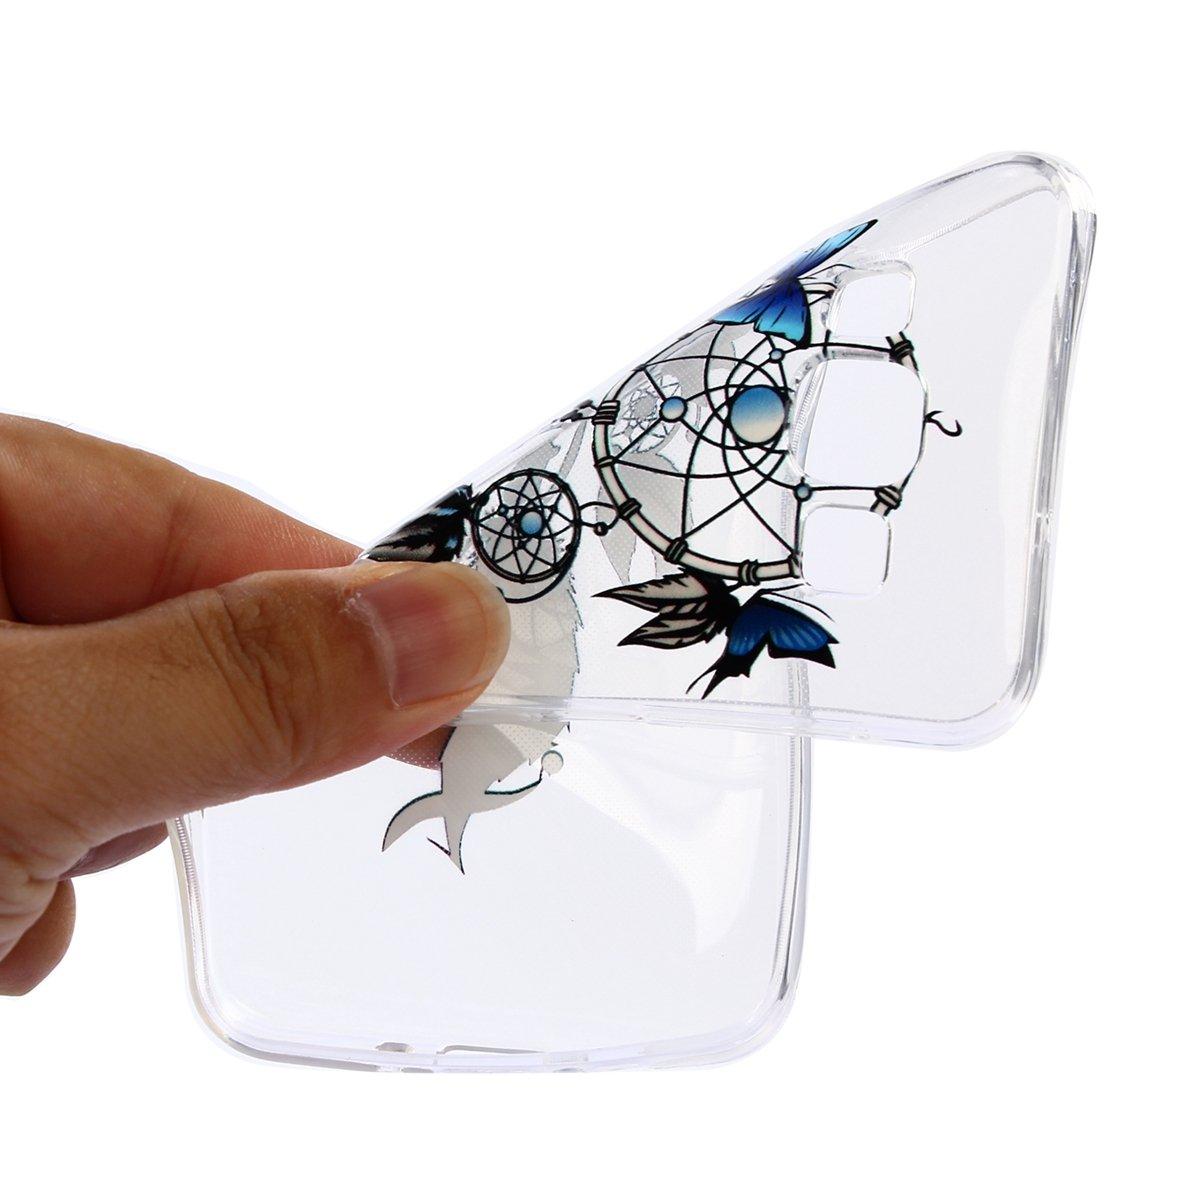 SainCat Custodia Galaxy A3 2015 Ultra Slim Custodia Trasparente Silicone Morbido Shock-Absorption Cover per Samsung Galaxy A3 2015-Lace Pattern